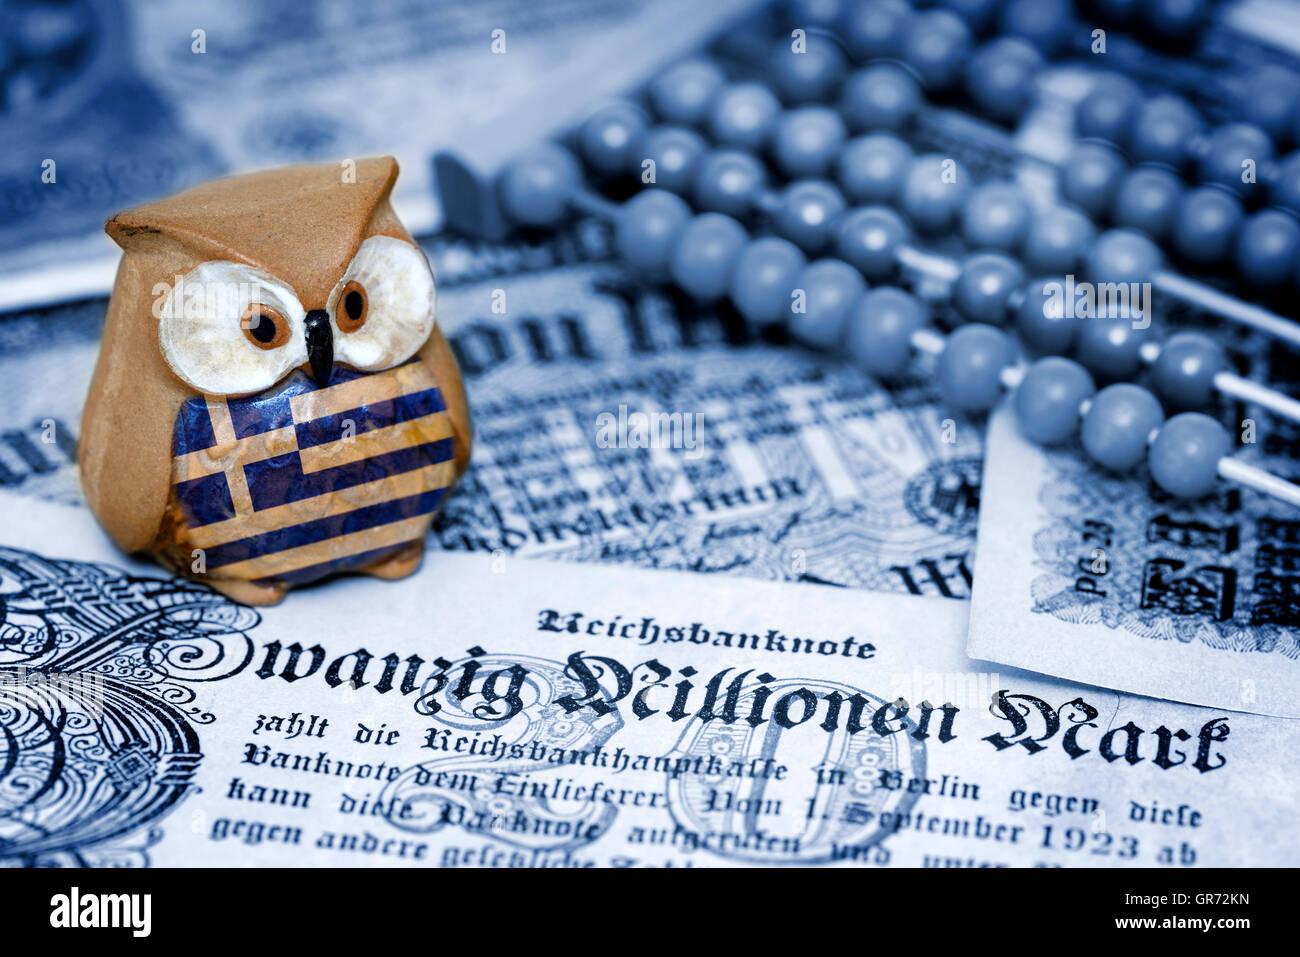 Greek Owl Sitting On Old German Inflation Money, German Reparations - Stock Image